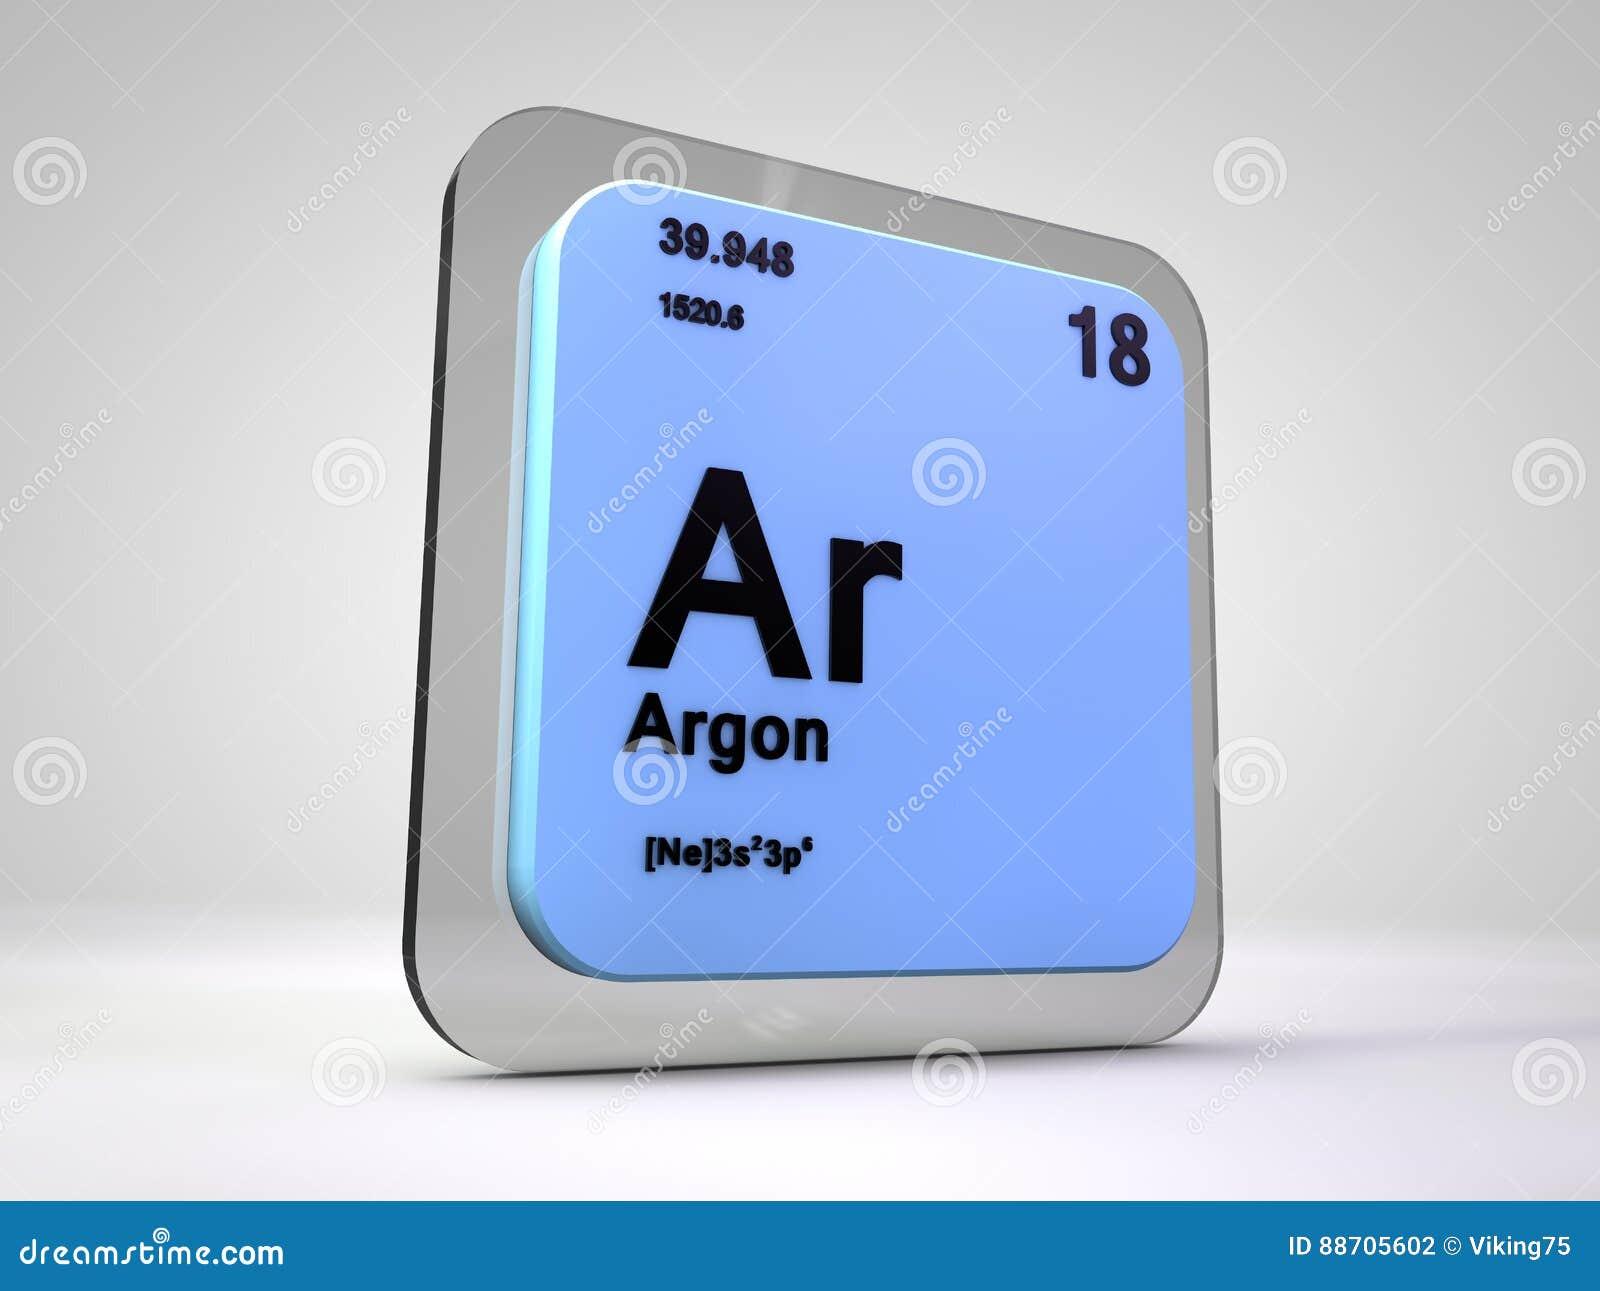 Argon Ar Chemical Element Periodic Table Stock Illustration